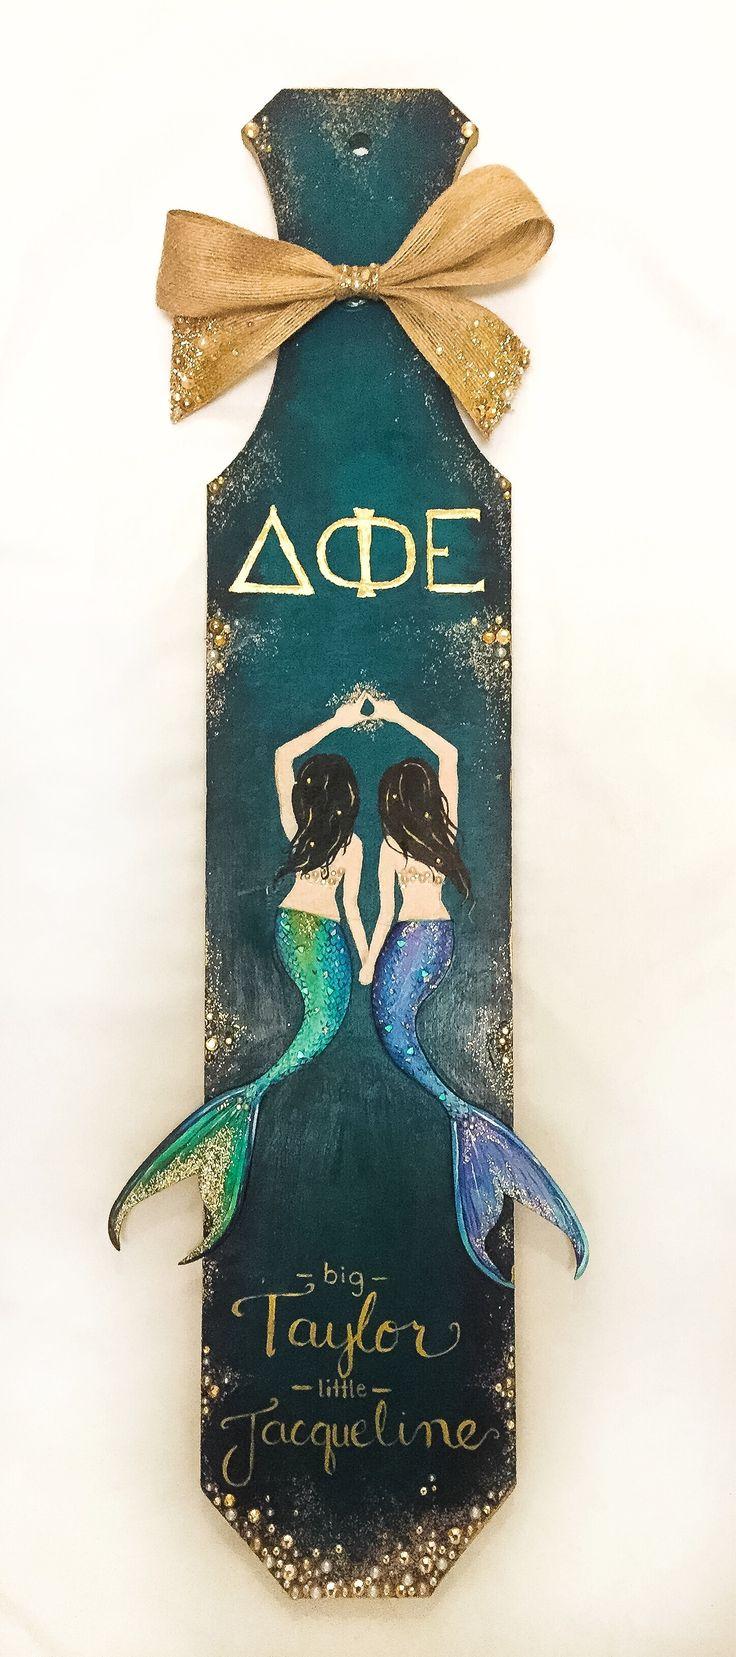 D Phi E Mermaid Sorority Paddle